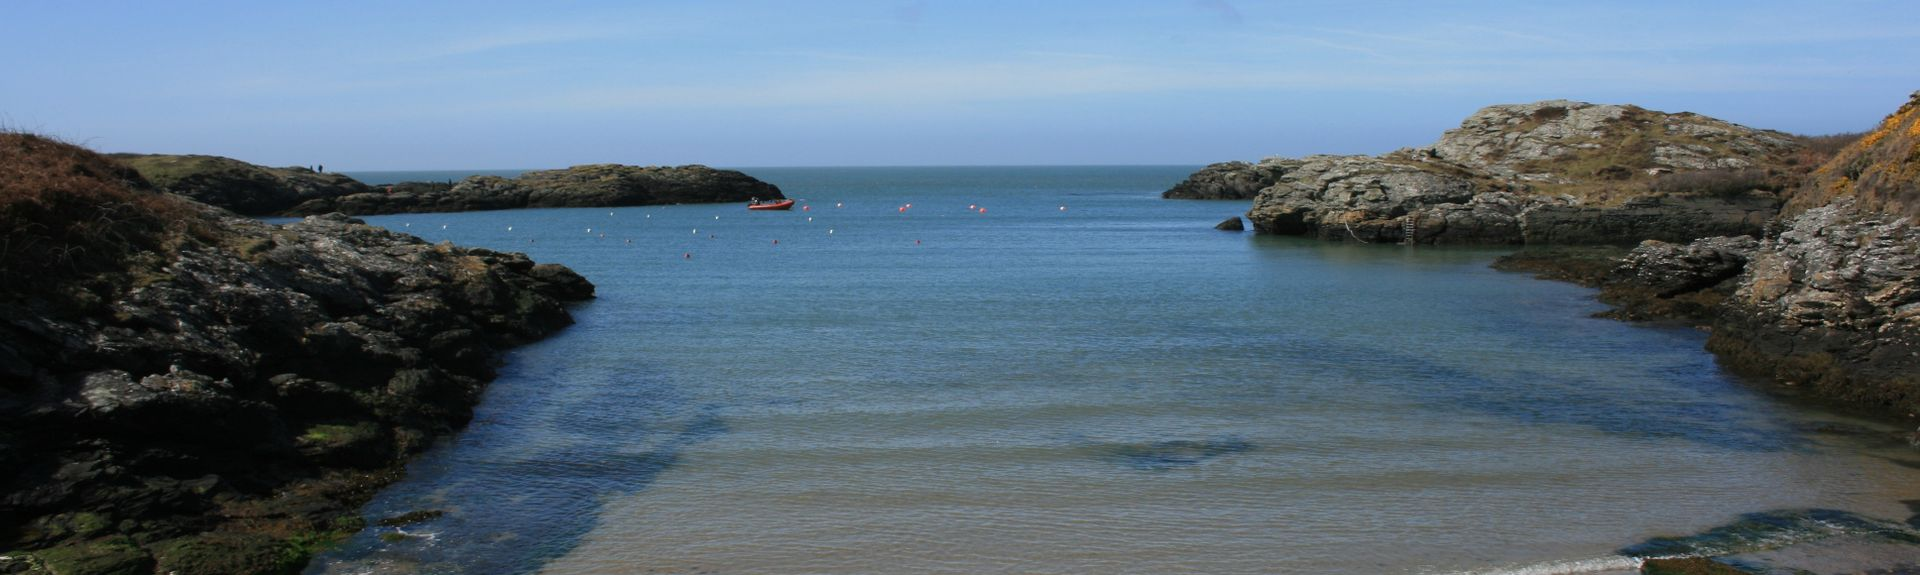 Rhosneigr, Isle of Anglesey, UK